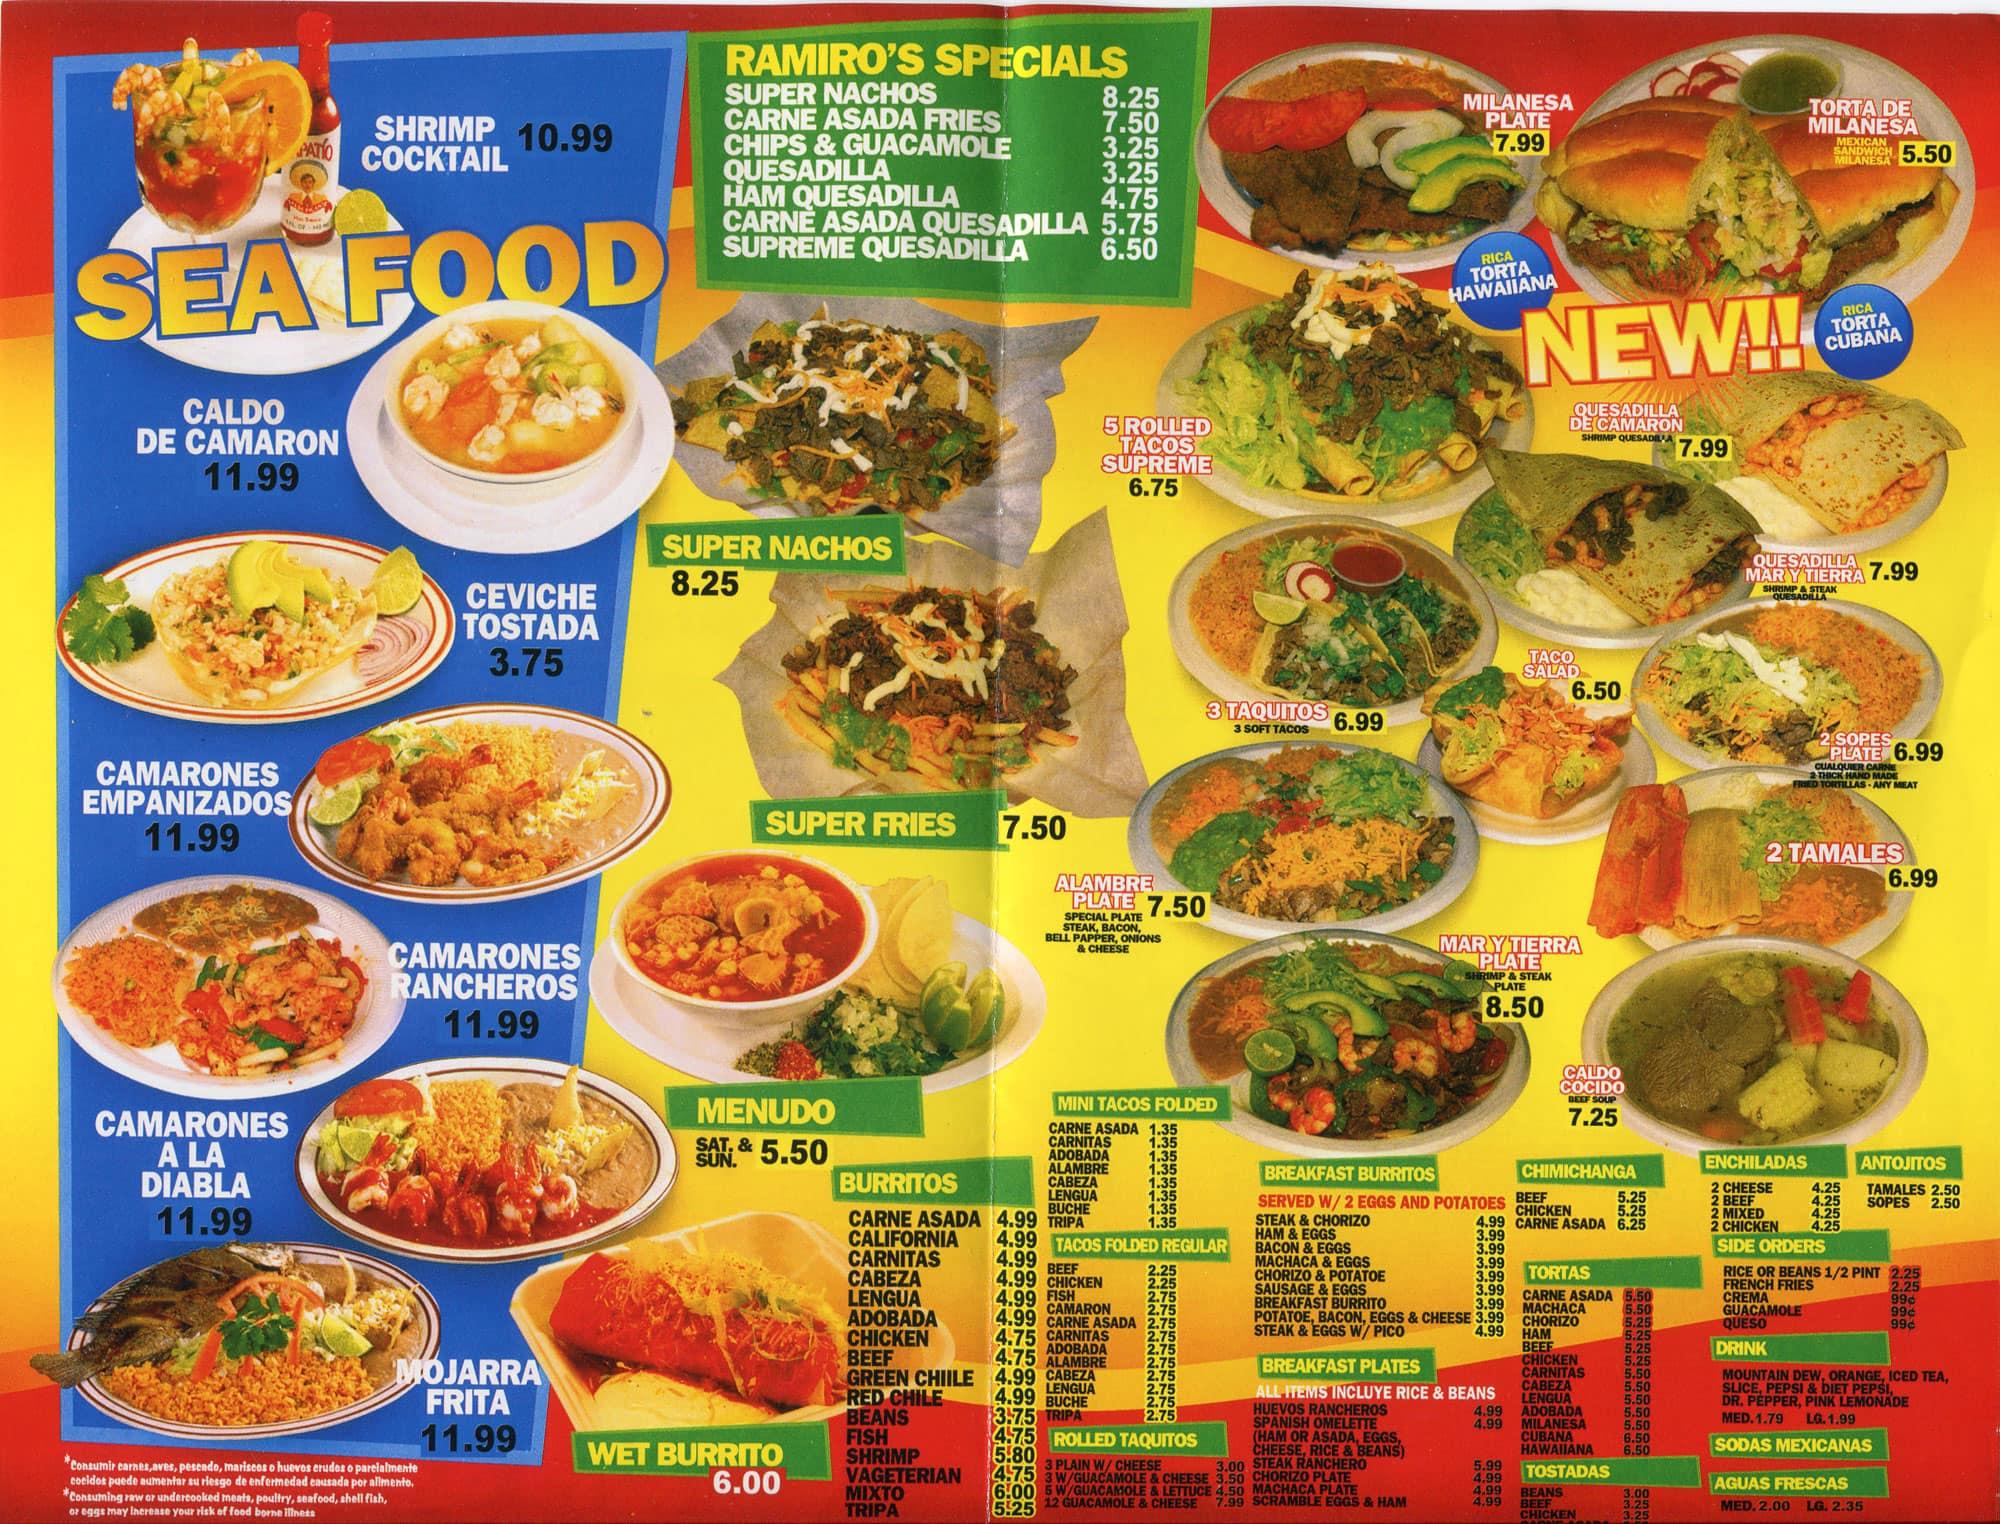 ramiro's mexican food menu - urbanspoon/zomato